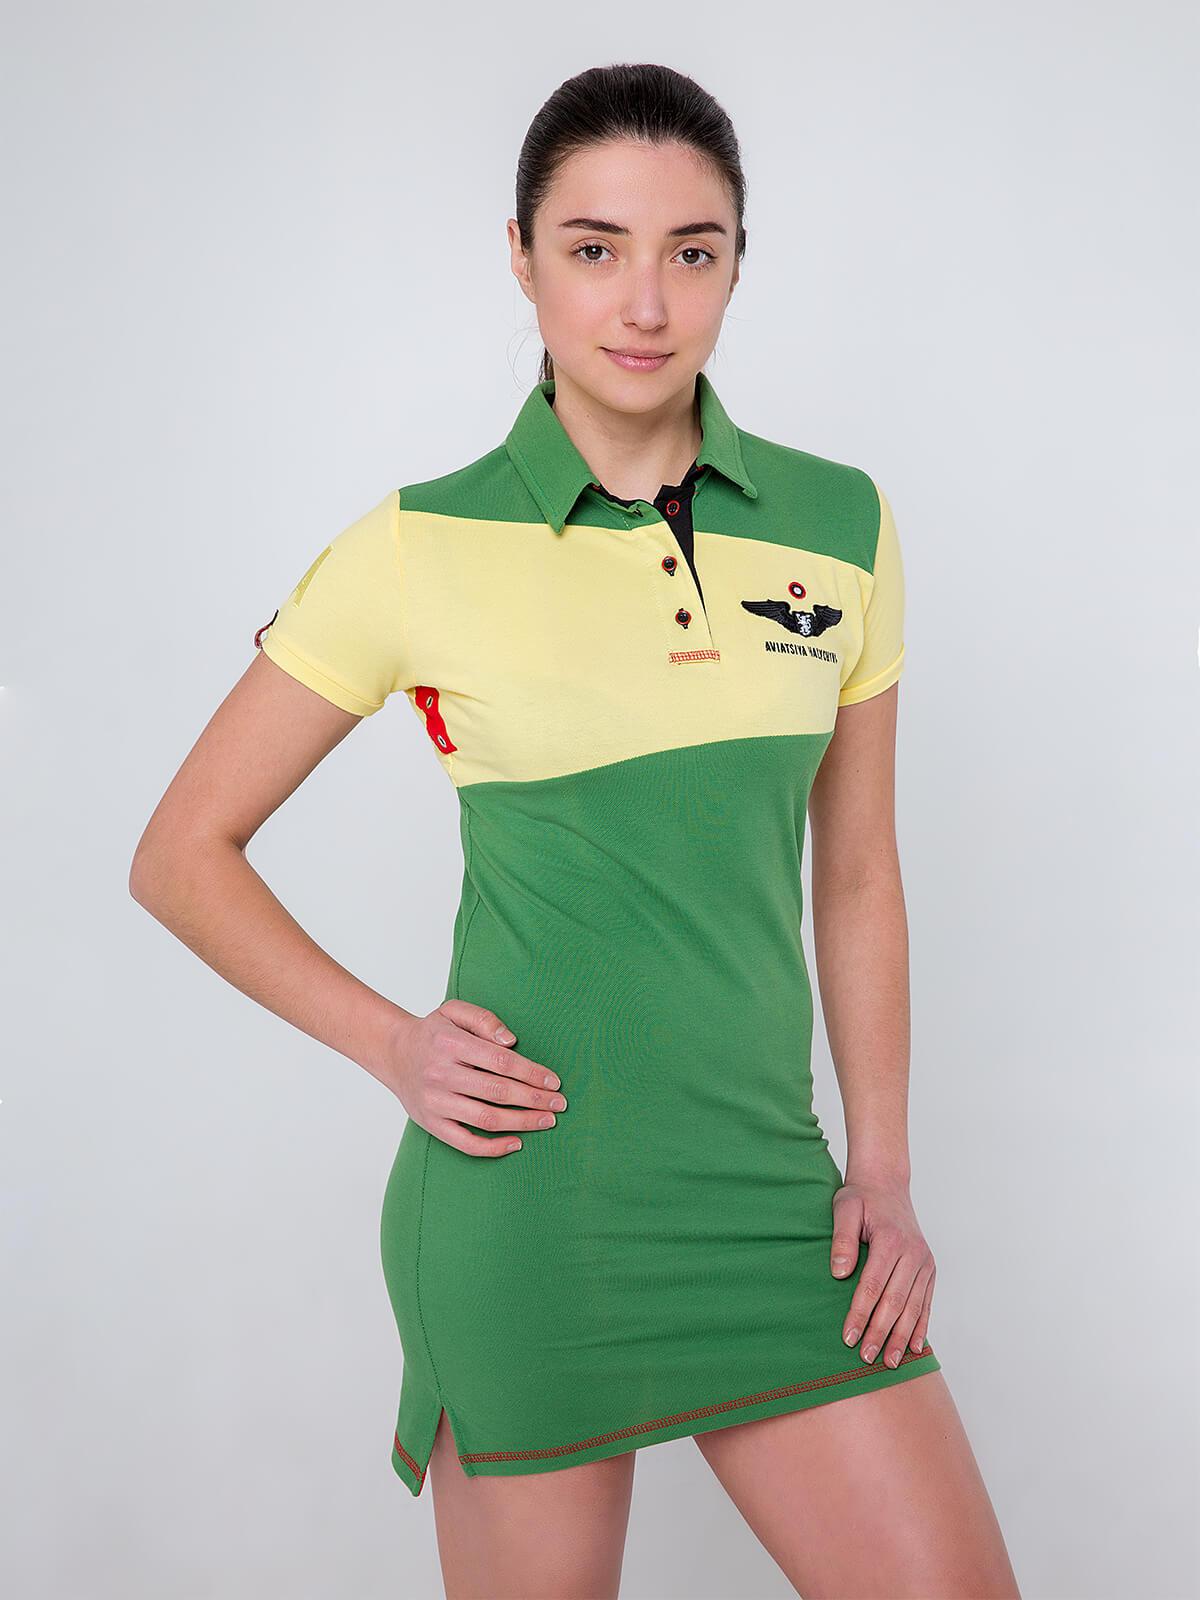 Women's Dress-Polo Shirt Darusia. Color yellow. Pique fabric: 100% cotton.